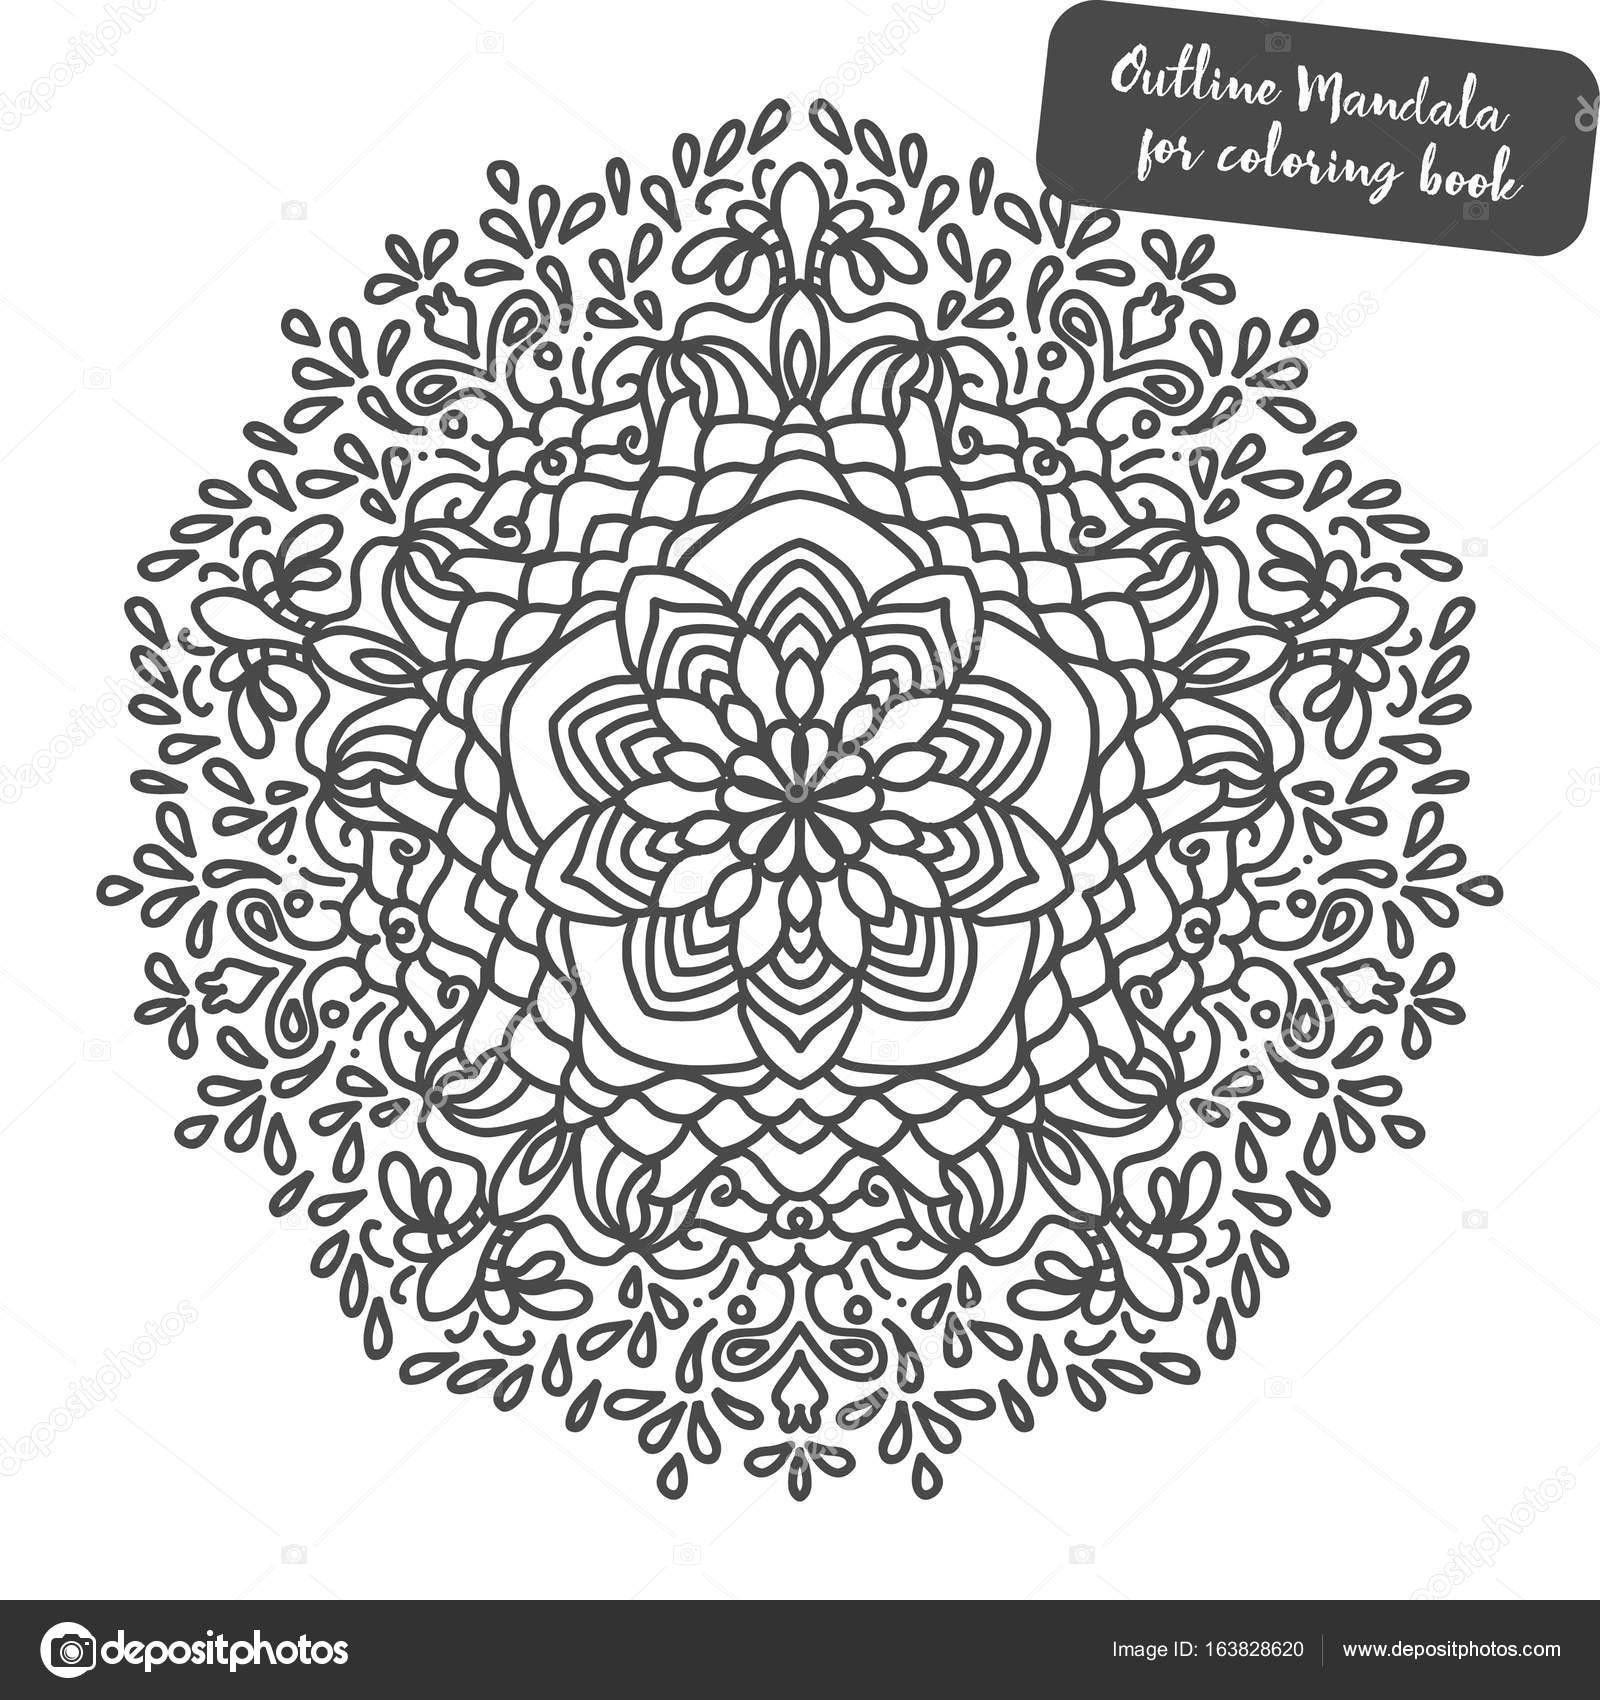 Mandala. Malvorlagen Buch. Indische antistress Medaillon. Abstrakte ...